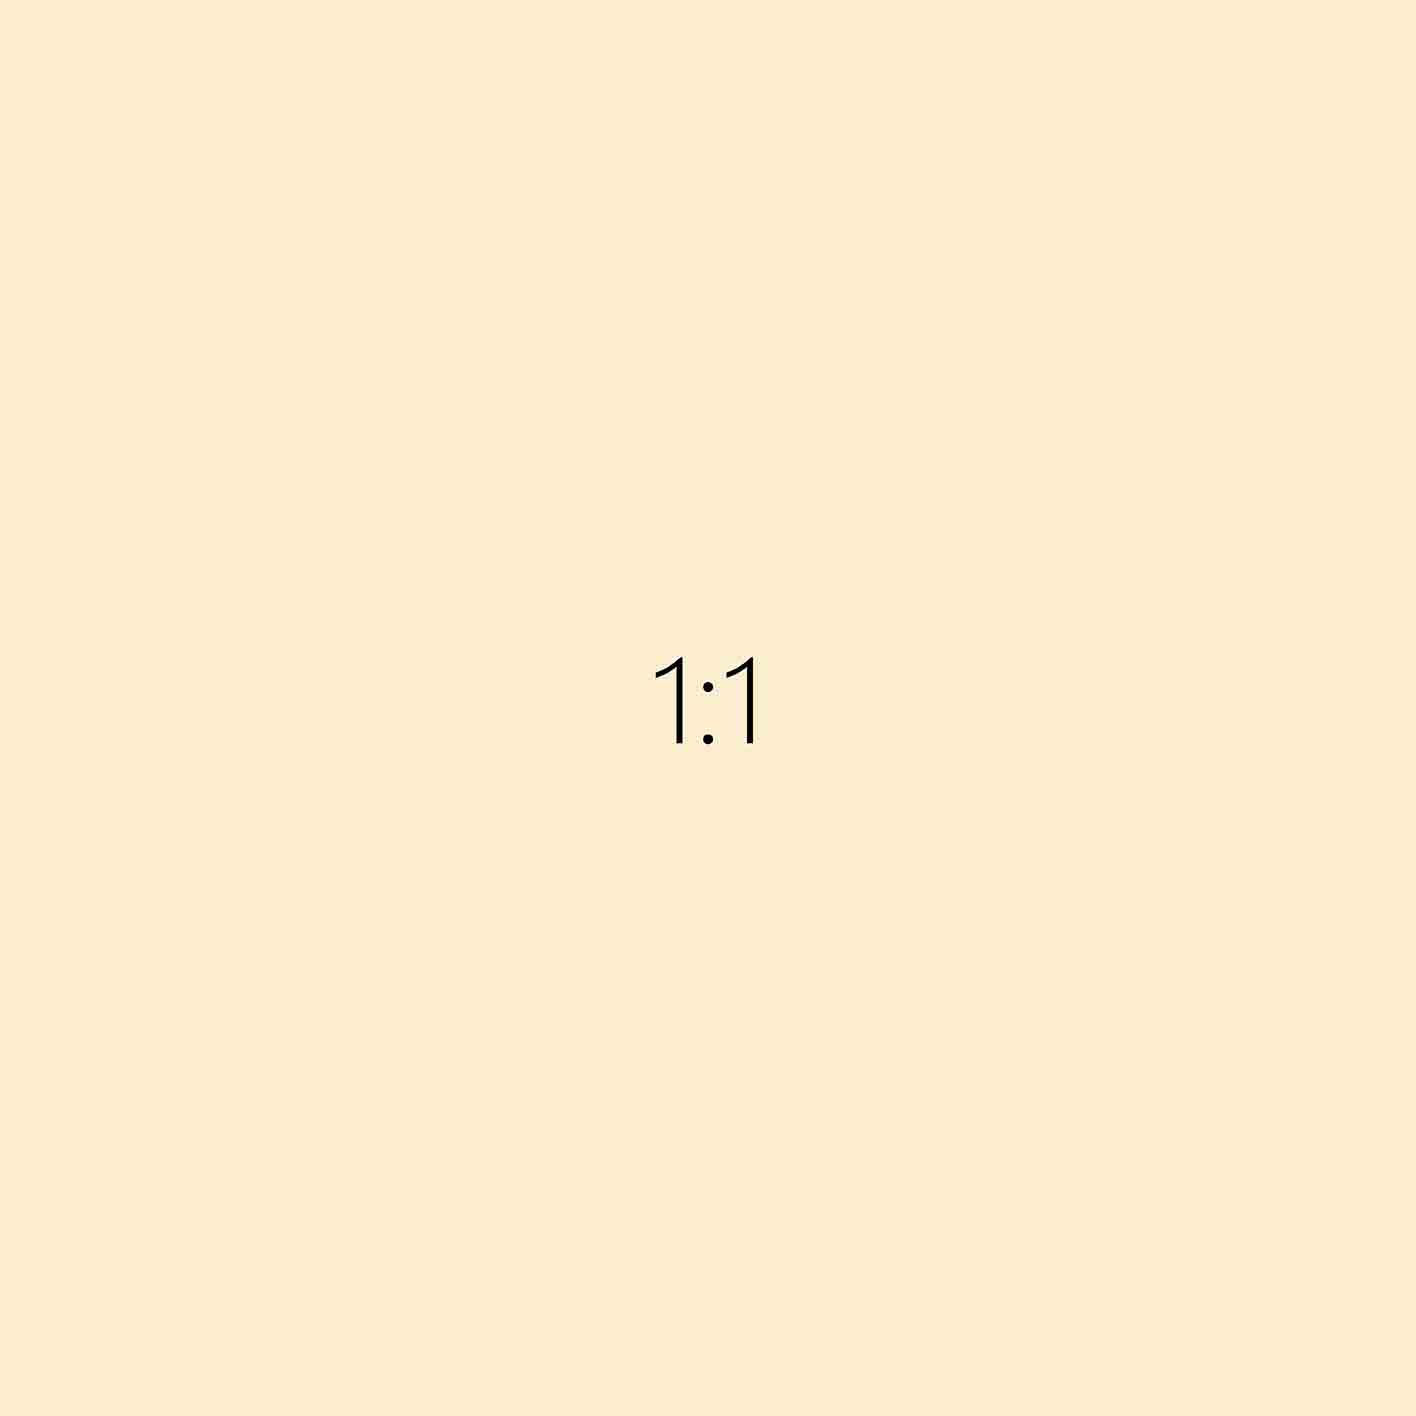 1416x1416